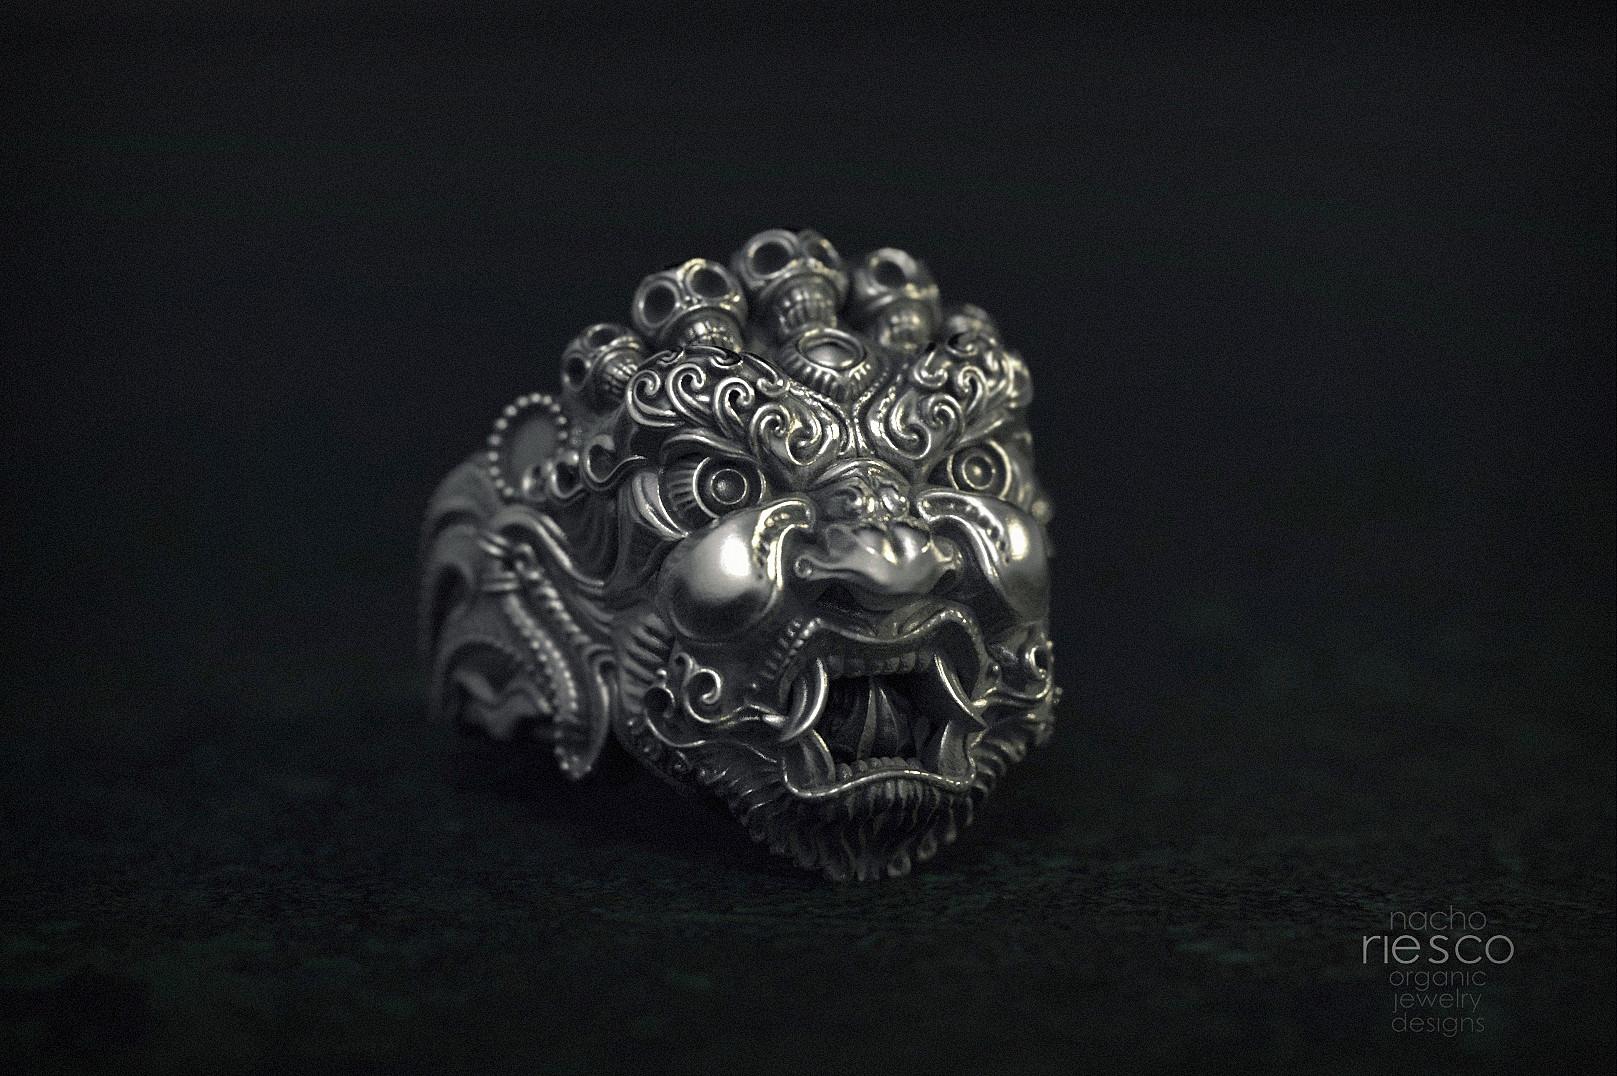 Nacho riesco gostanza anillo mascara tibetana 3